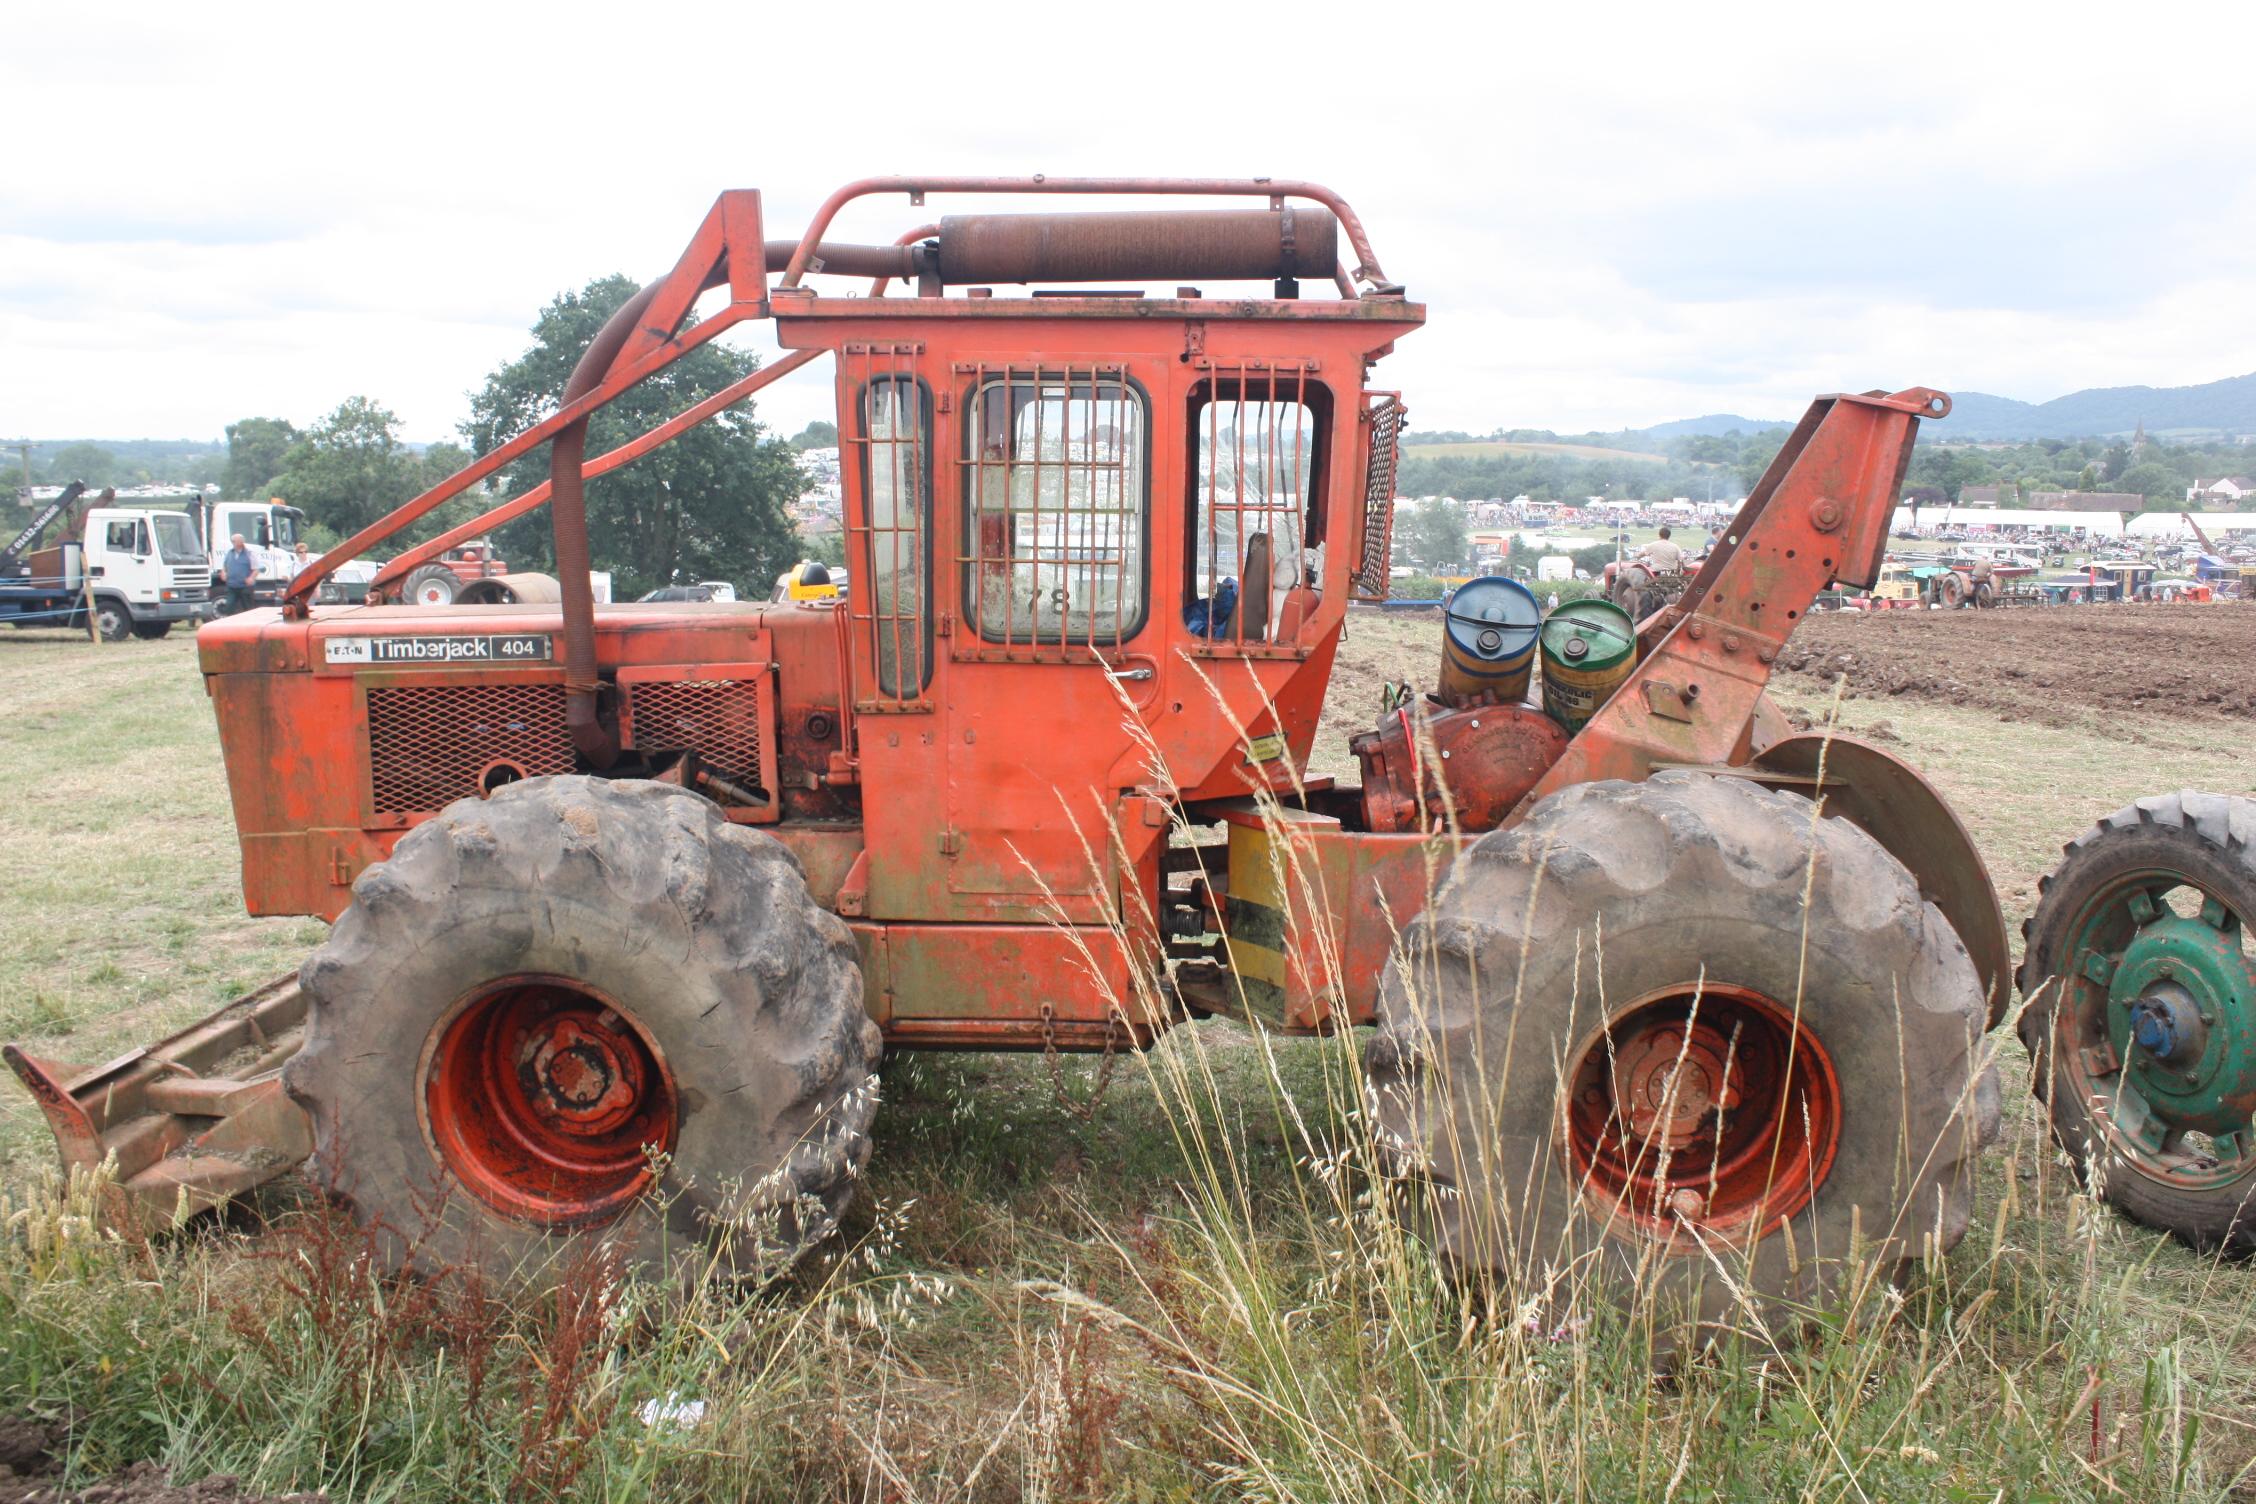 File:Eaton Timberjack 404 at Welland 2010 - 8252.jpg